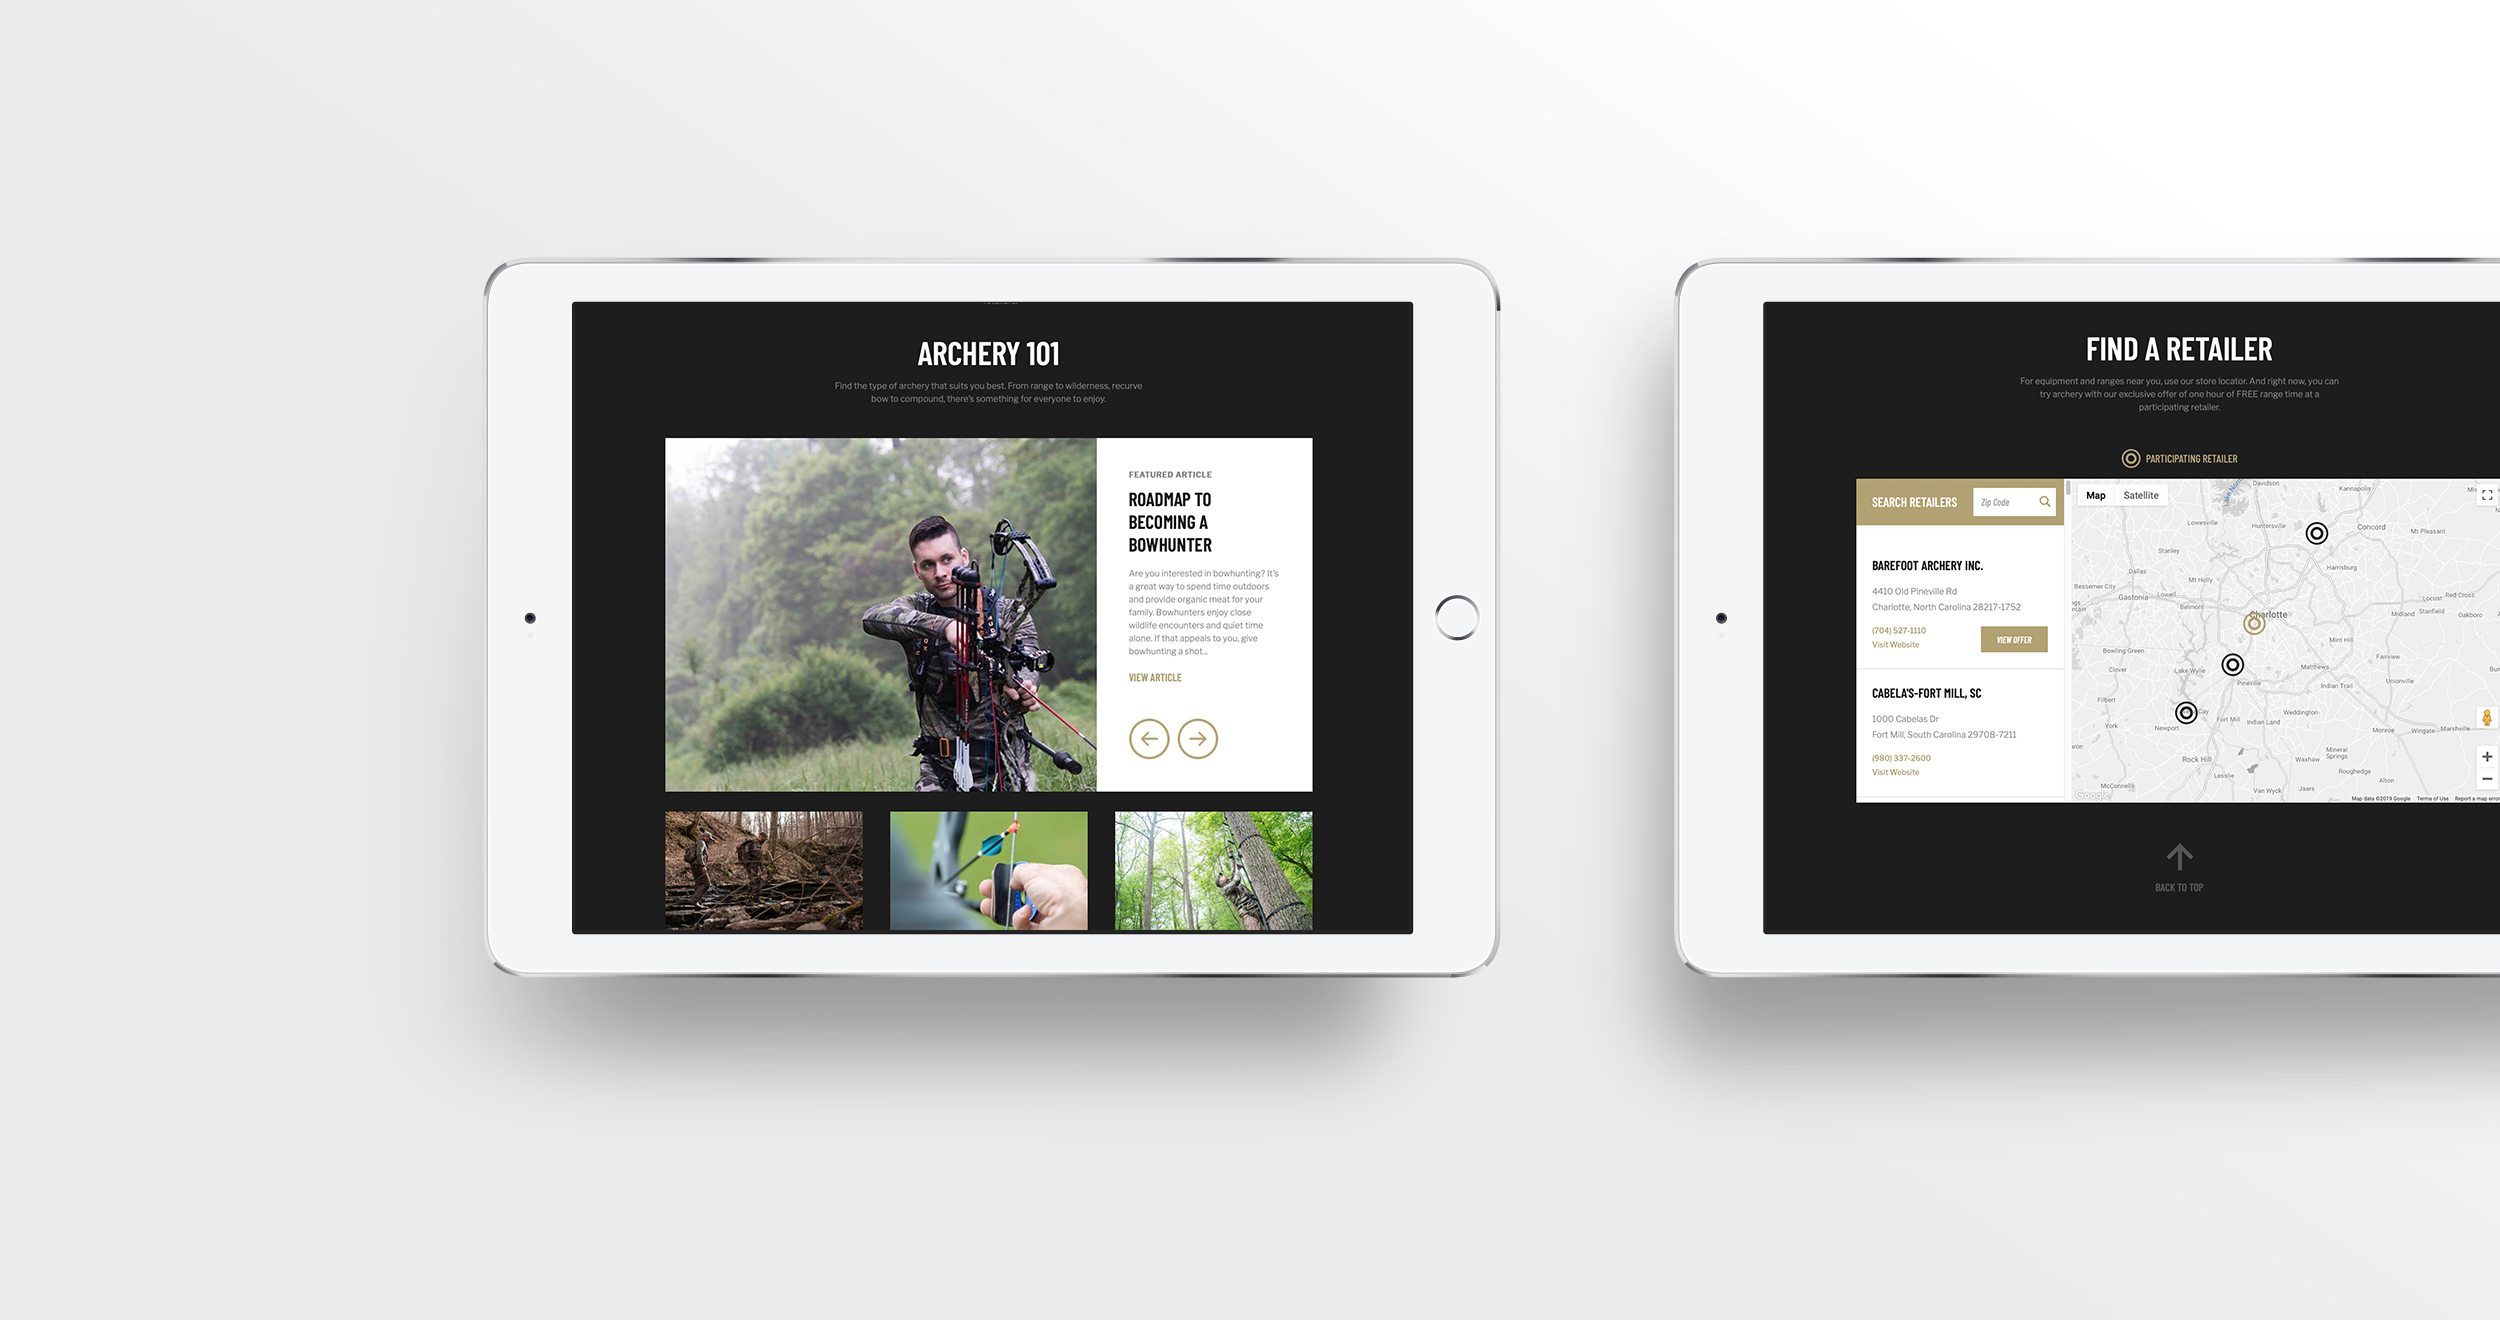 TTIN_LandingPage_iPad.jpg